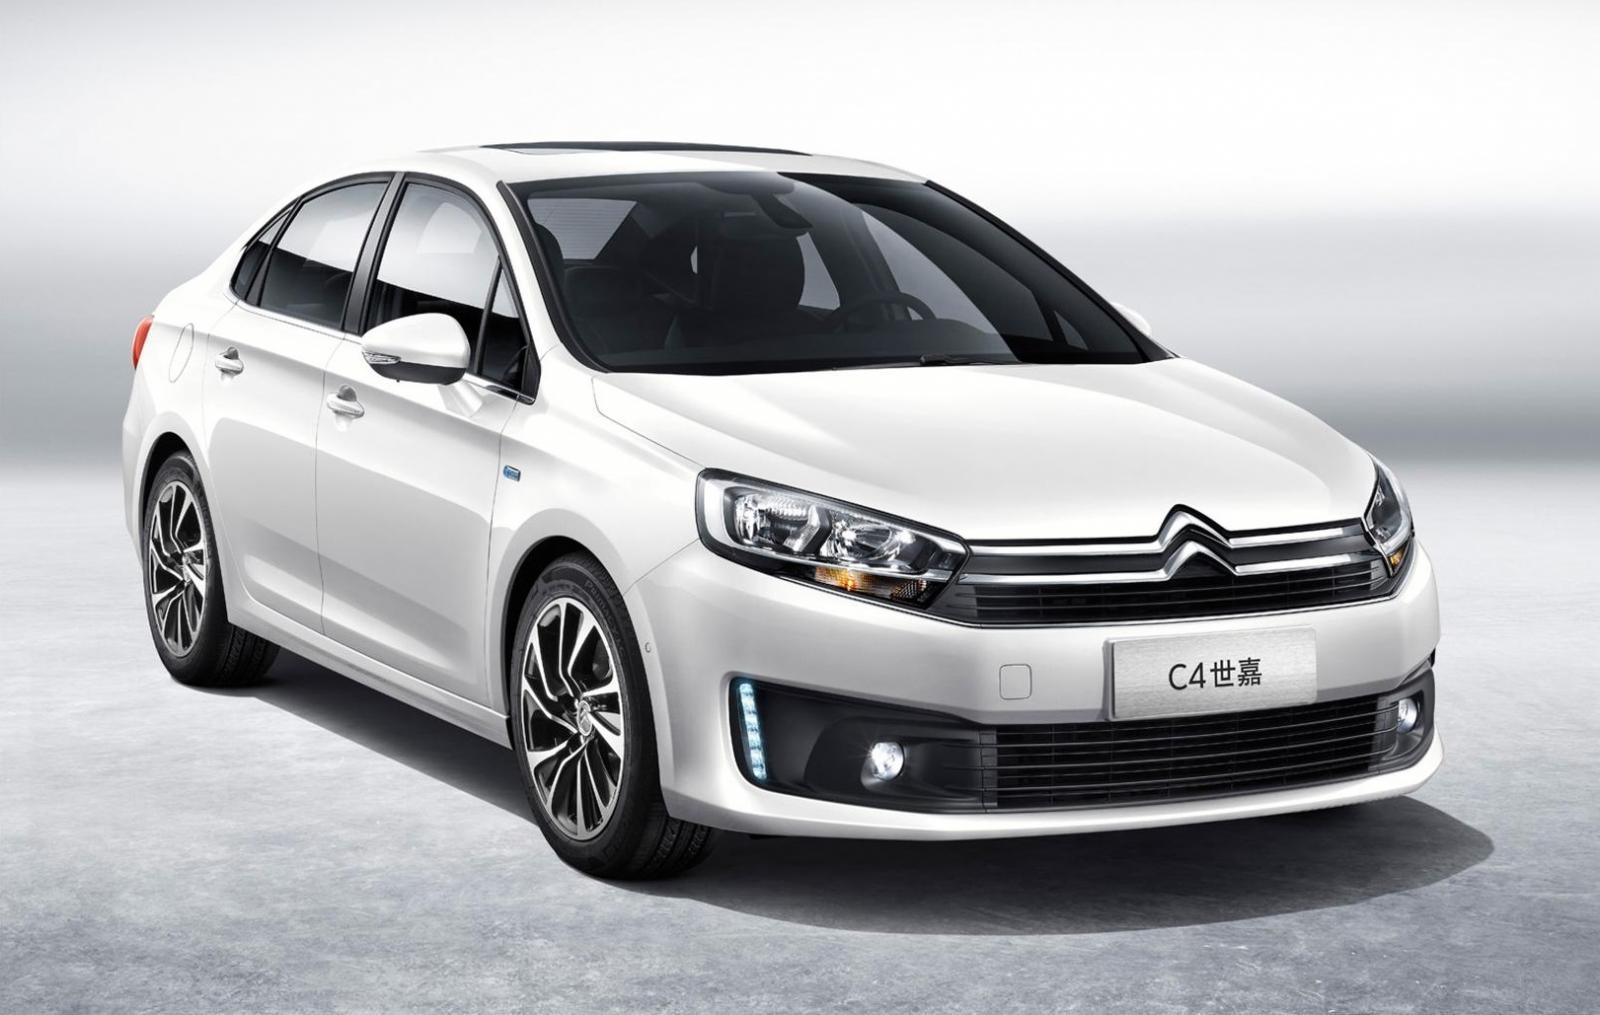 Foto de Citroën C4 Sedán para China (1/4)